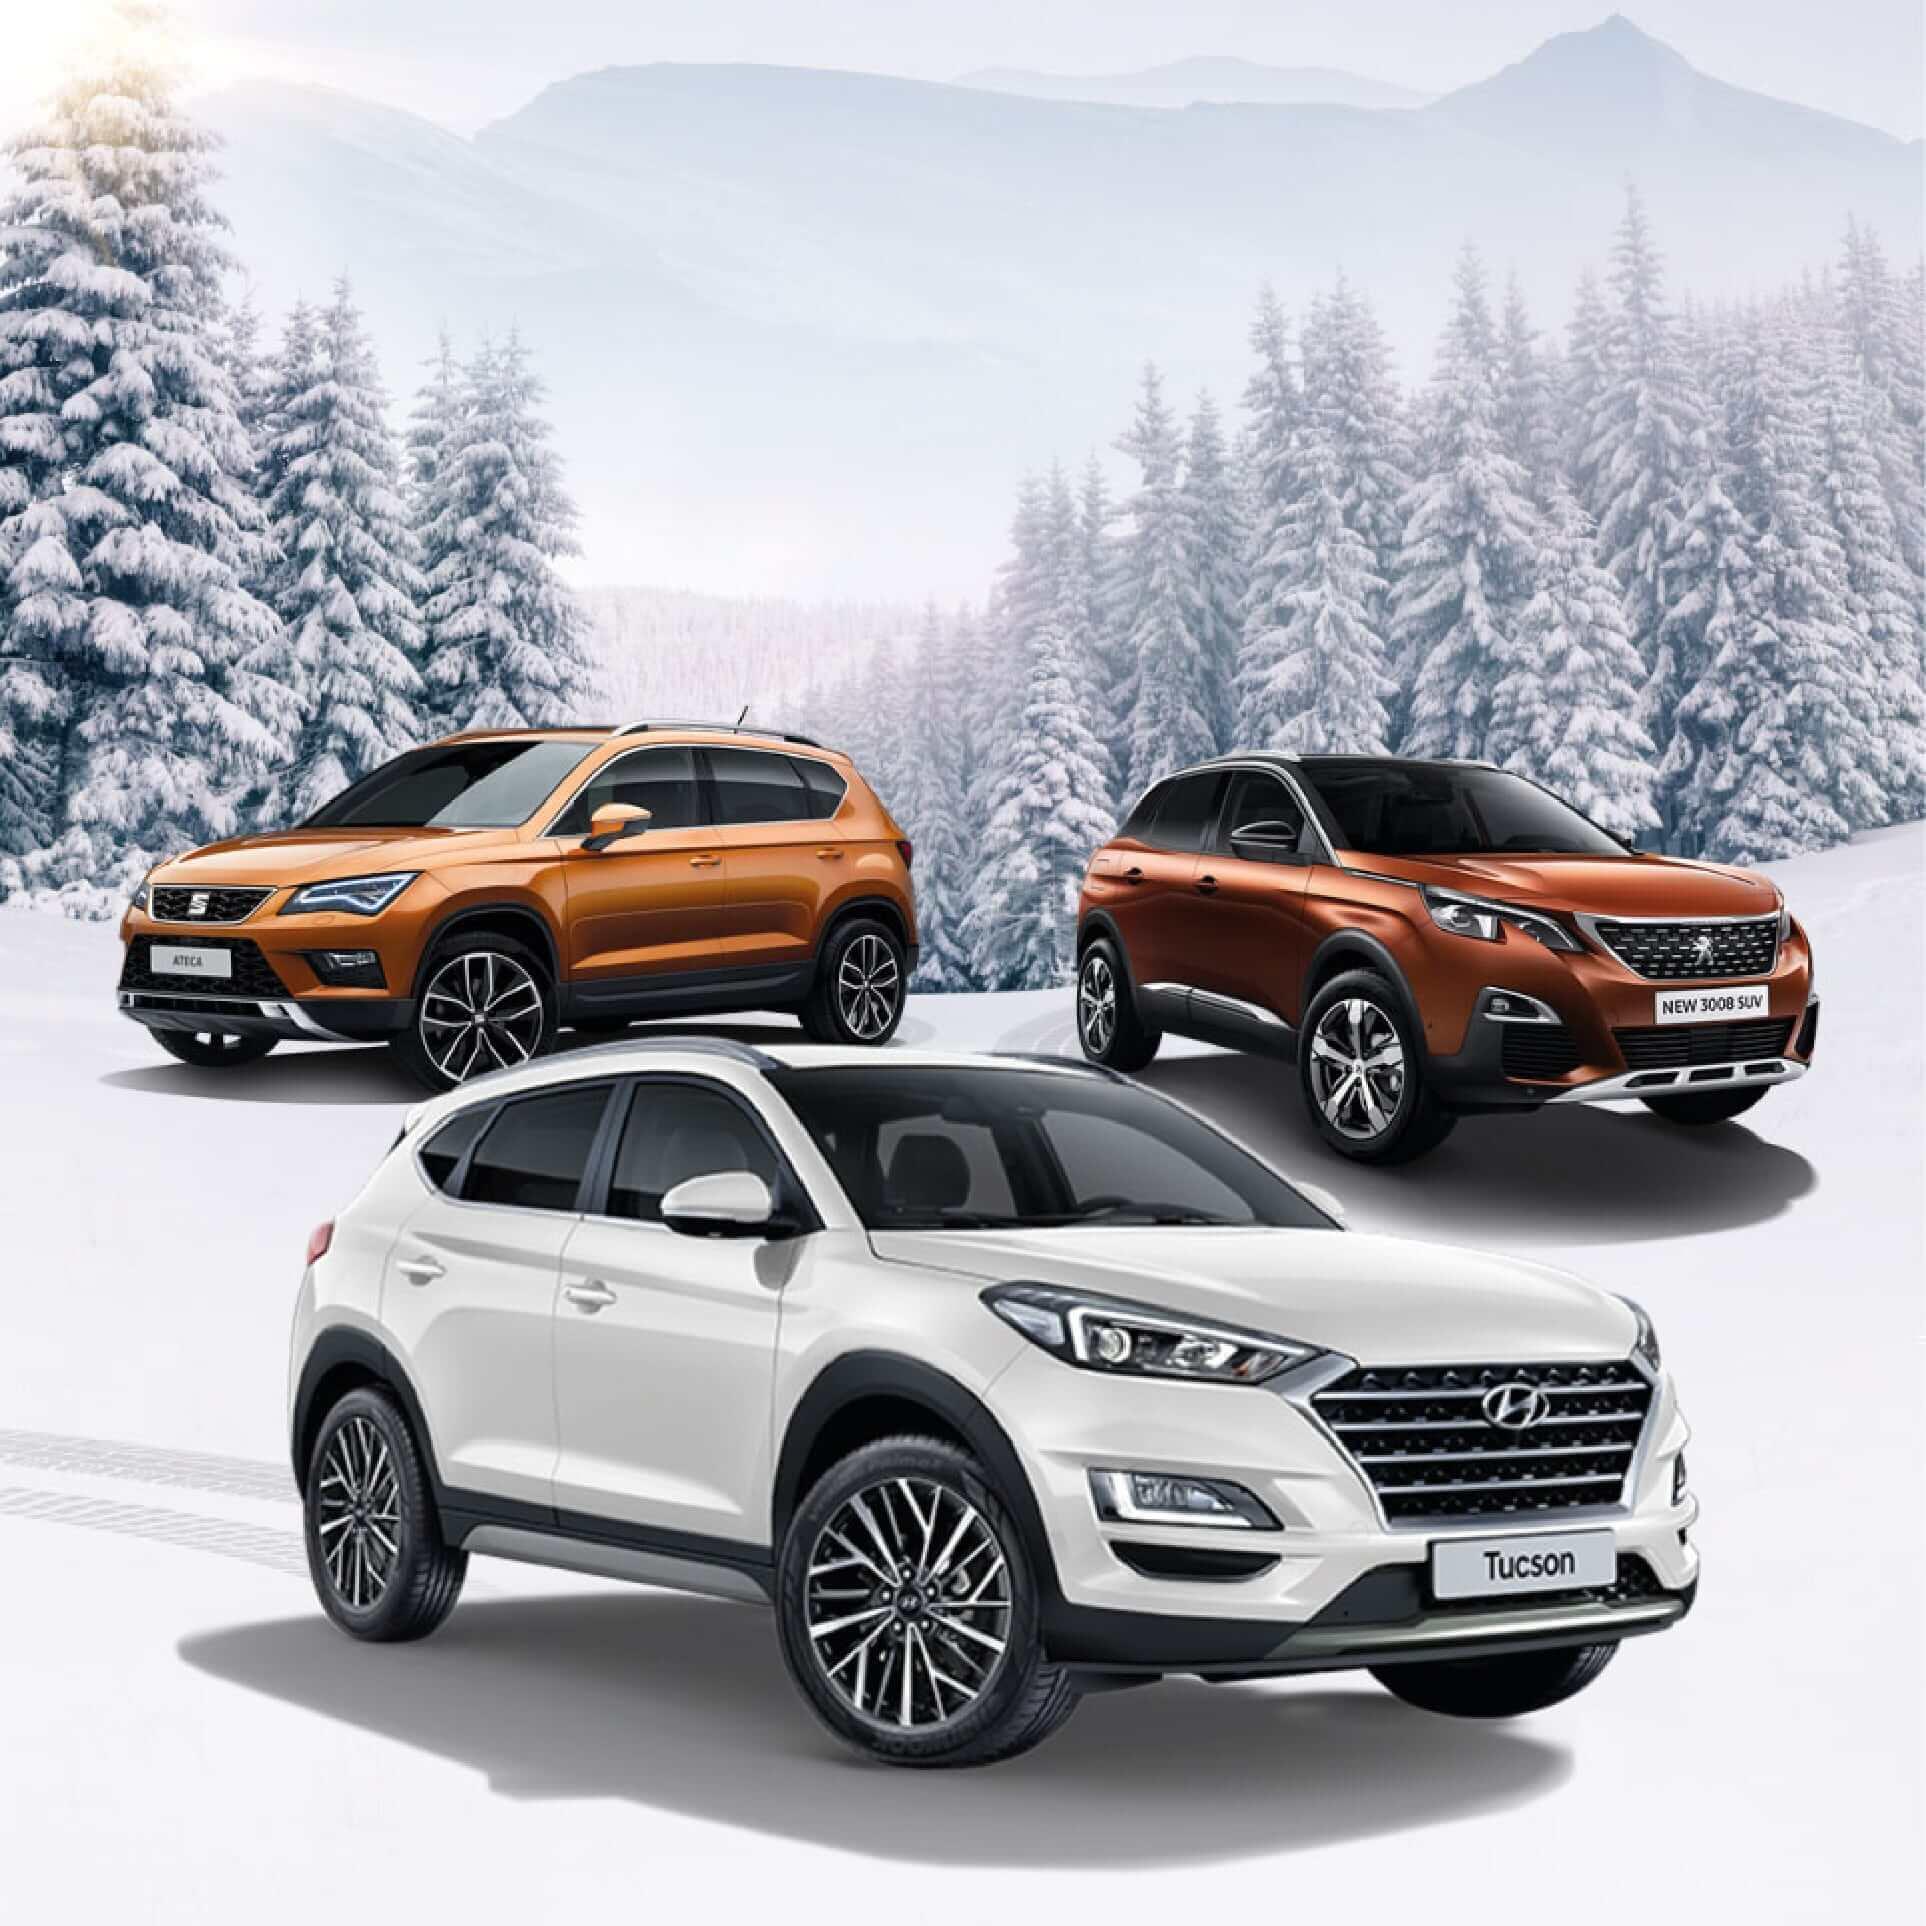 Cars 2 Winter SUV picture